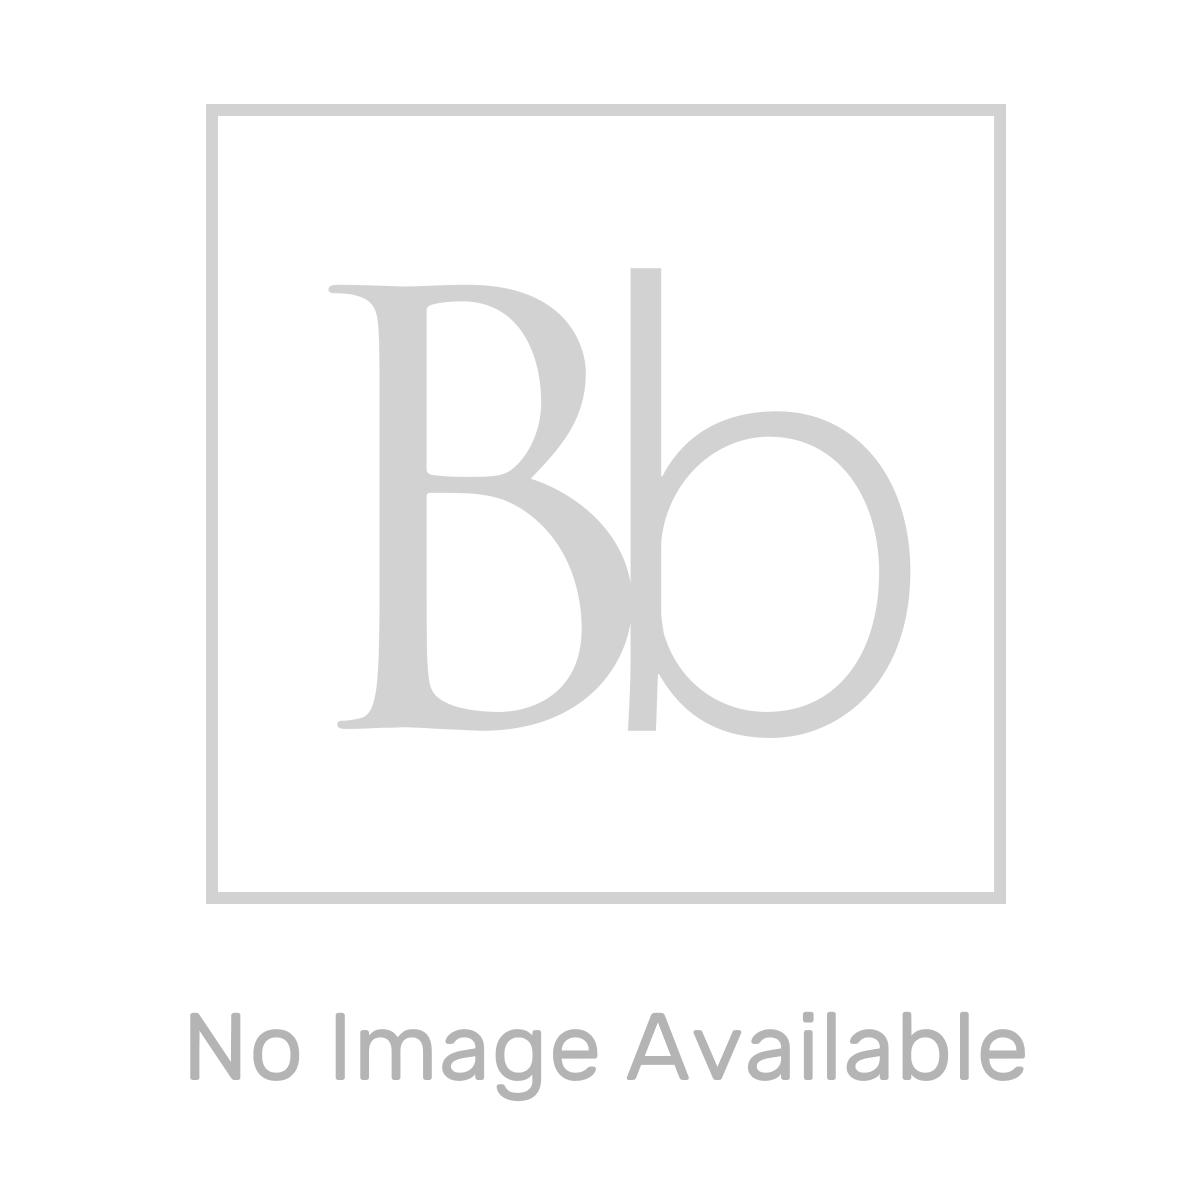 Nuie Athena Stone Grey 2 Drawer Floor Standing Vanity Unit with 18mm Worktop 600mm